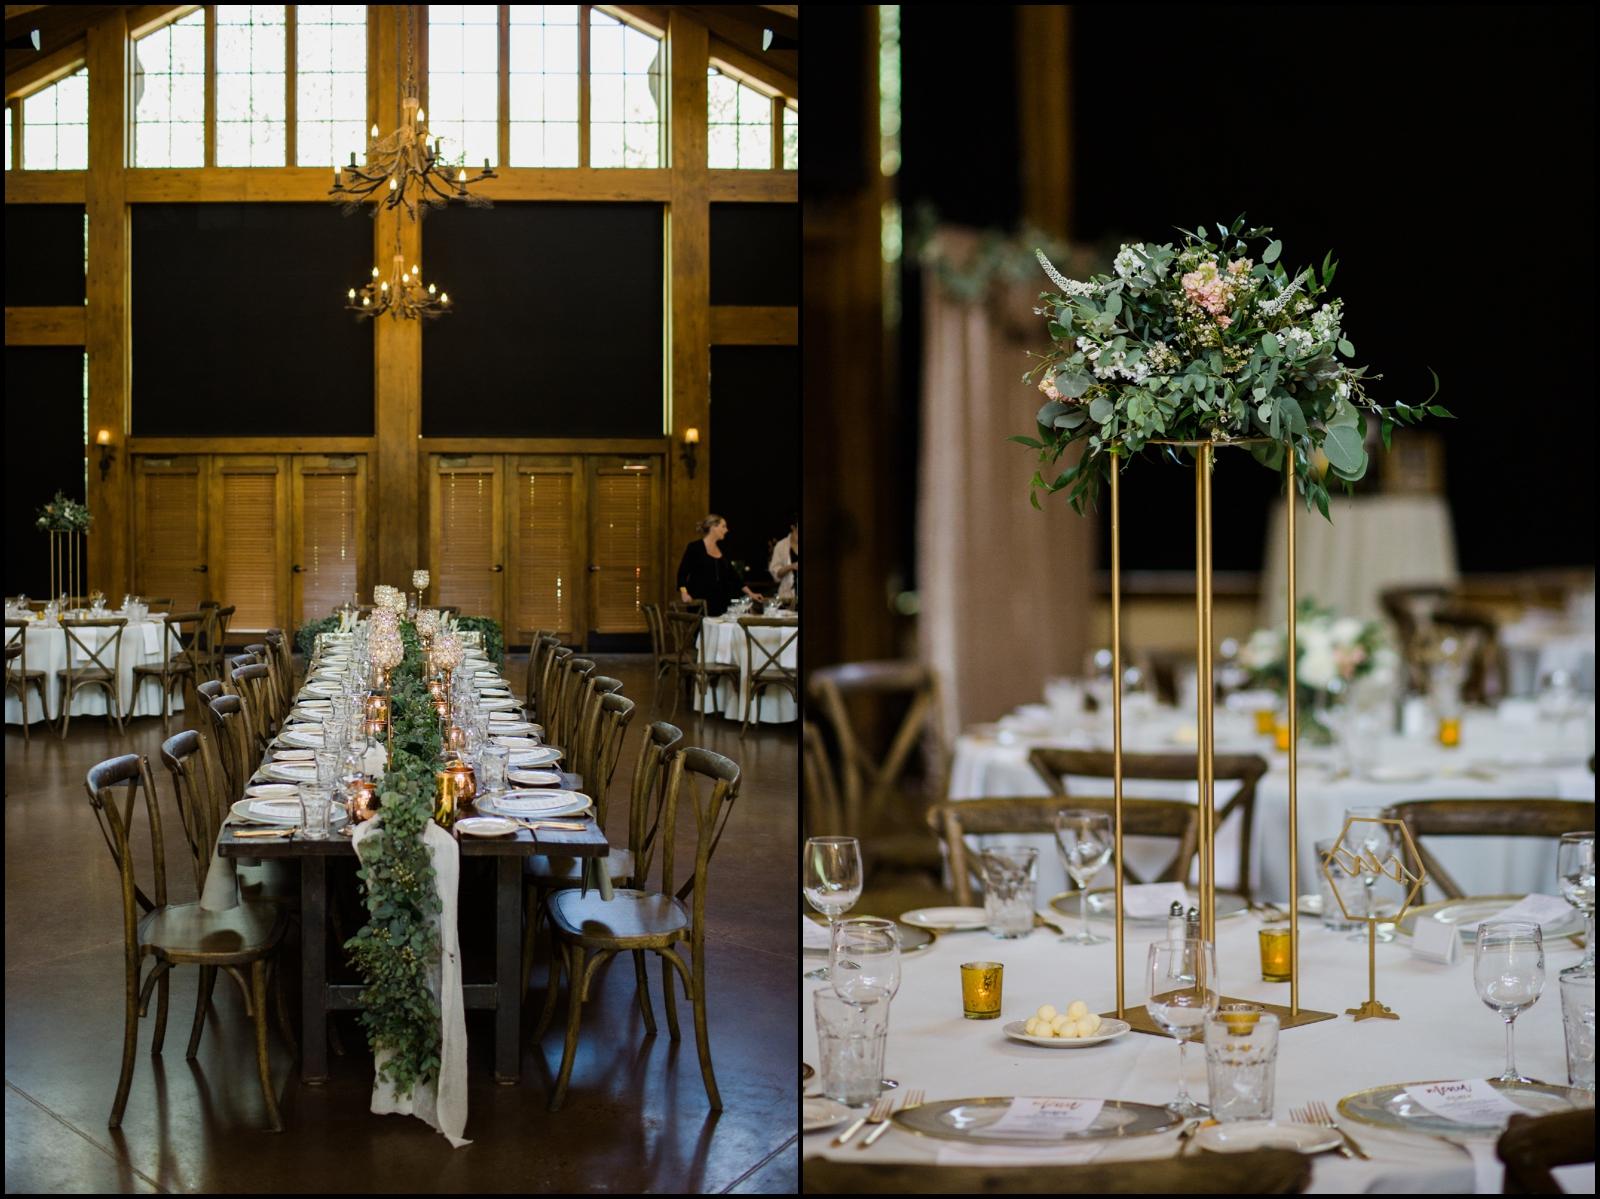 Wedding reception table set